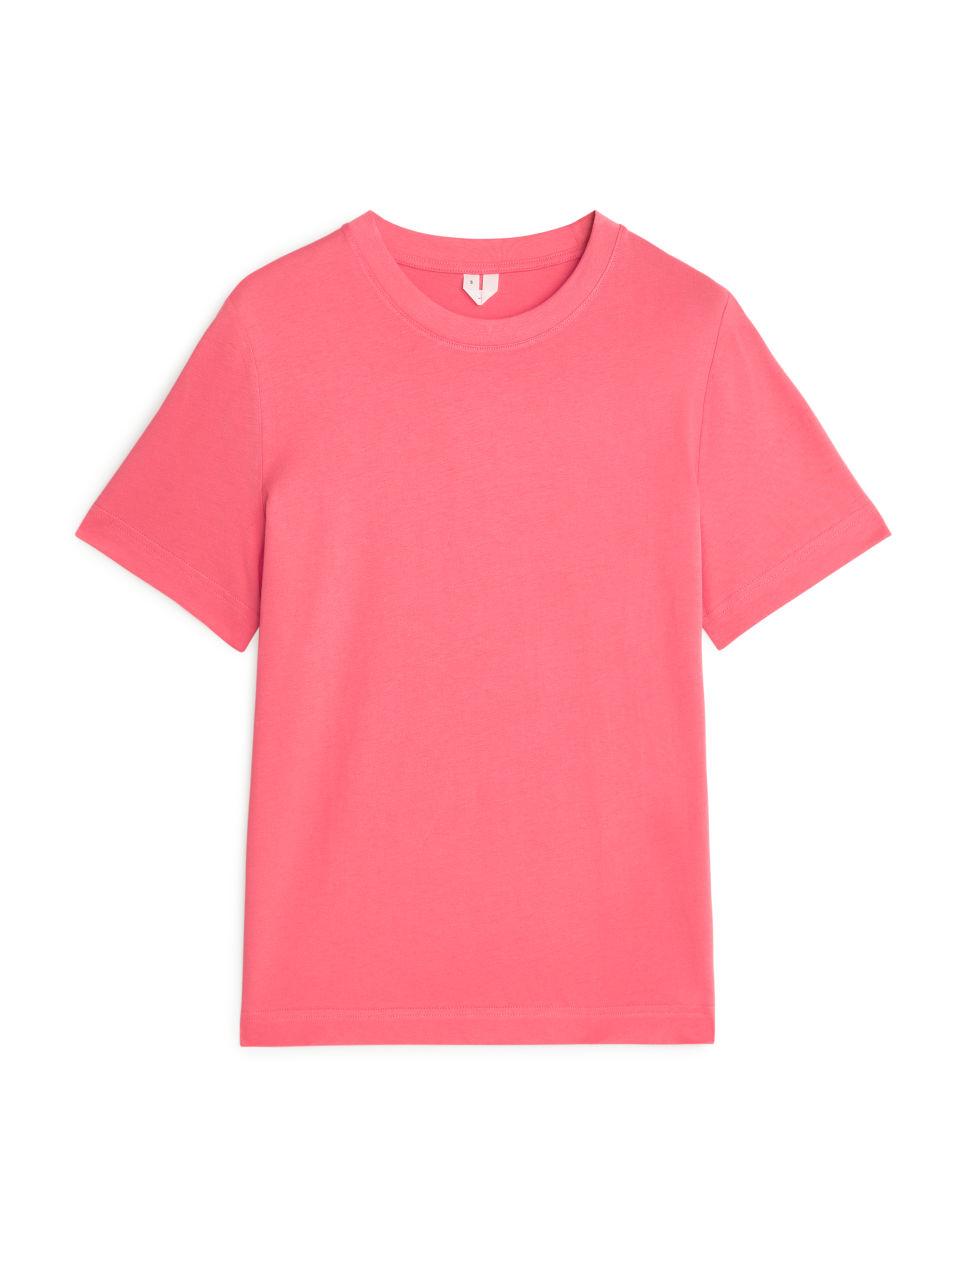 Crew-Neck T-shirt - Pink